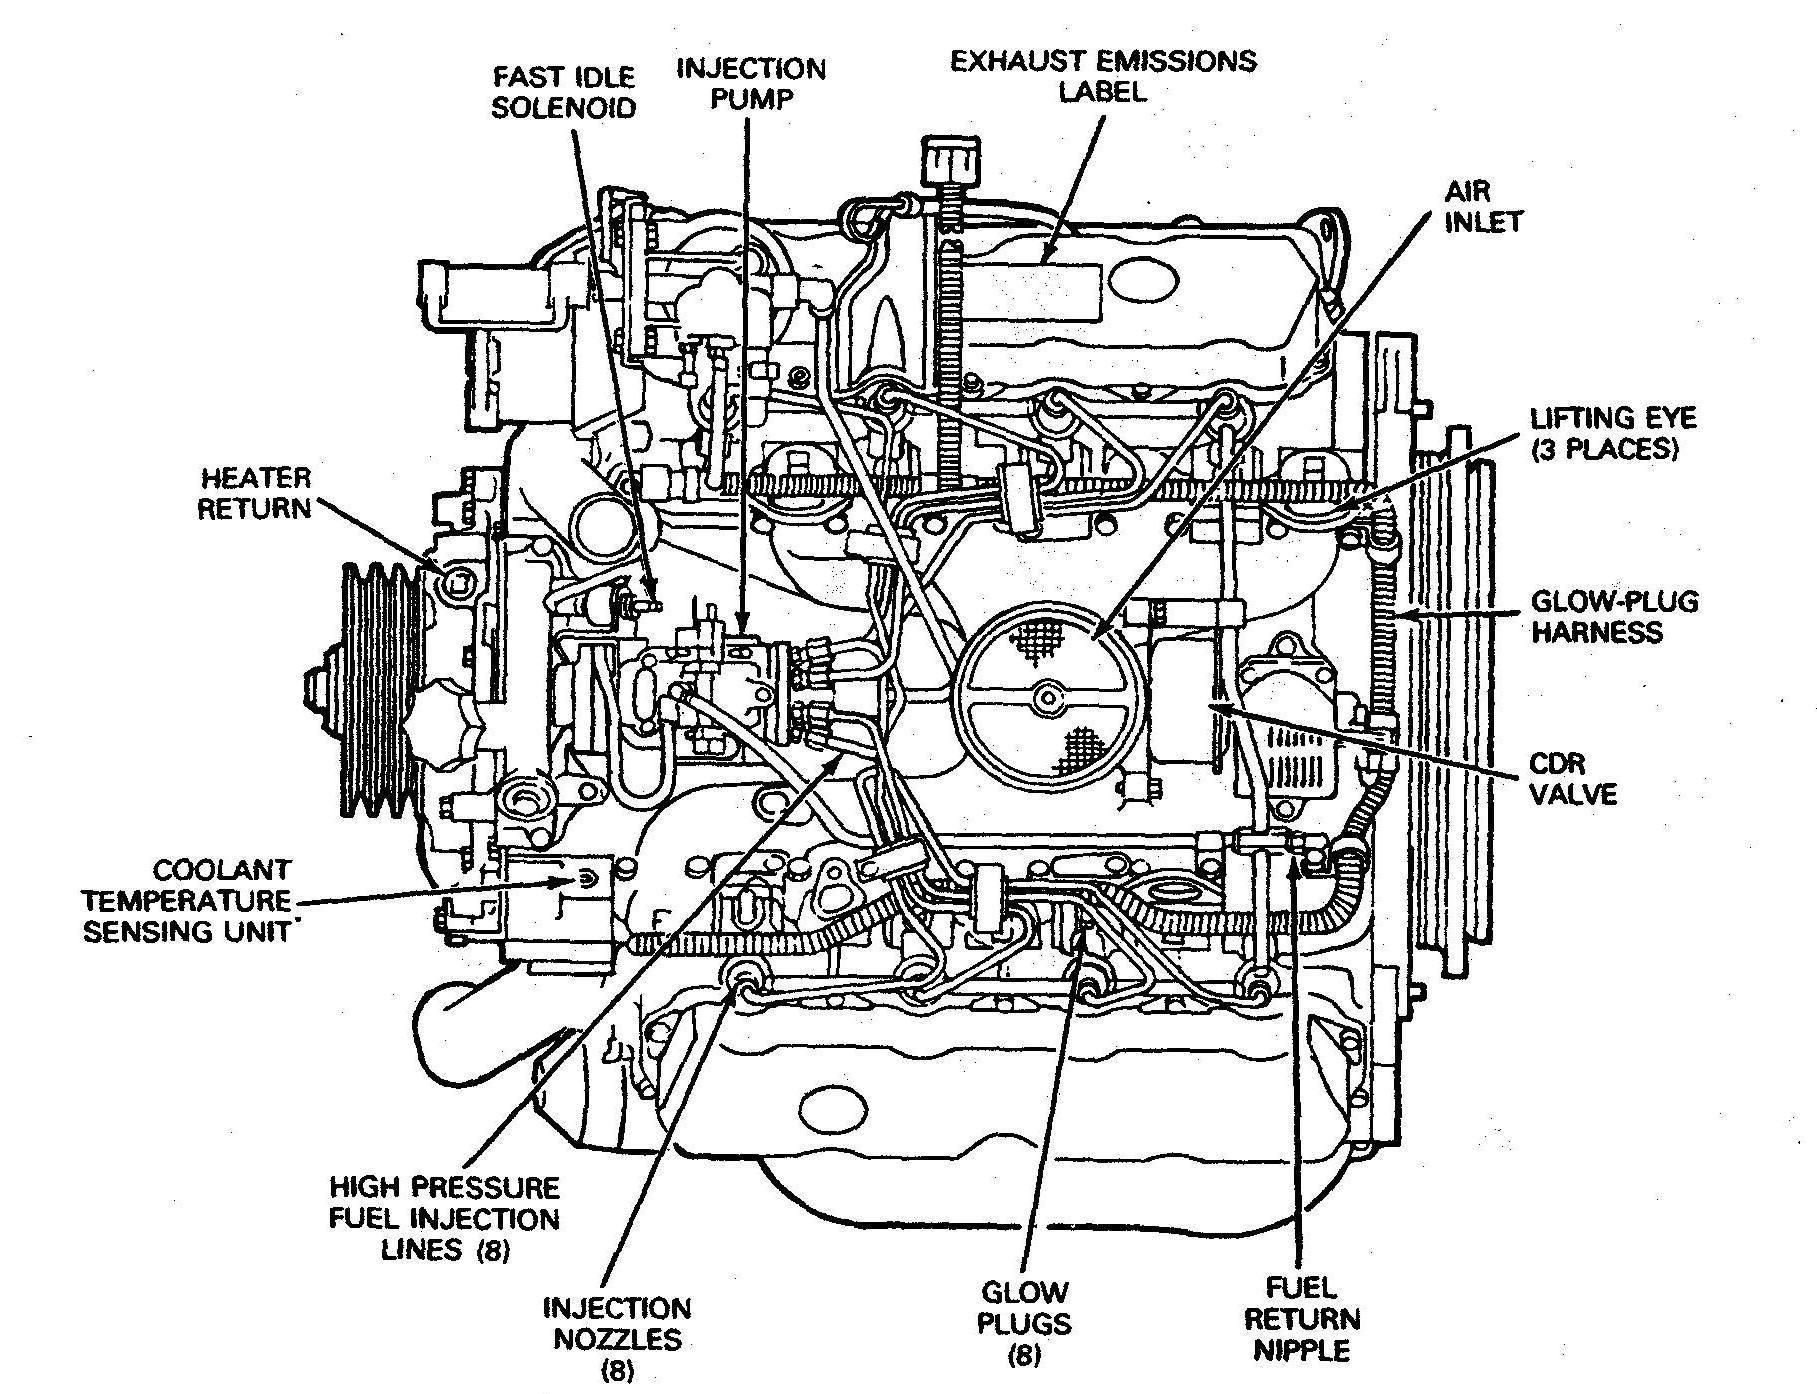 1986 ford F150 Under Hood Diagram Diagram] 3 3 Engine Diagram Full Version Hd Quality Engine Of 1986 ford F150 Under Hood Diagram